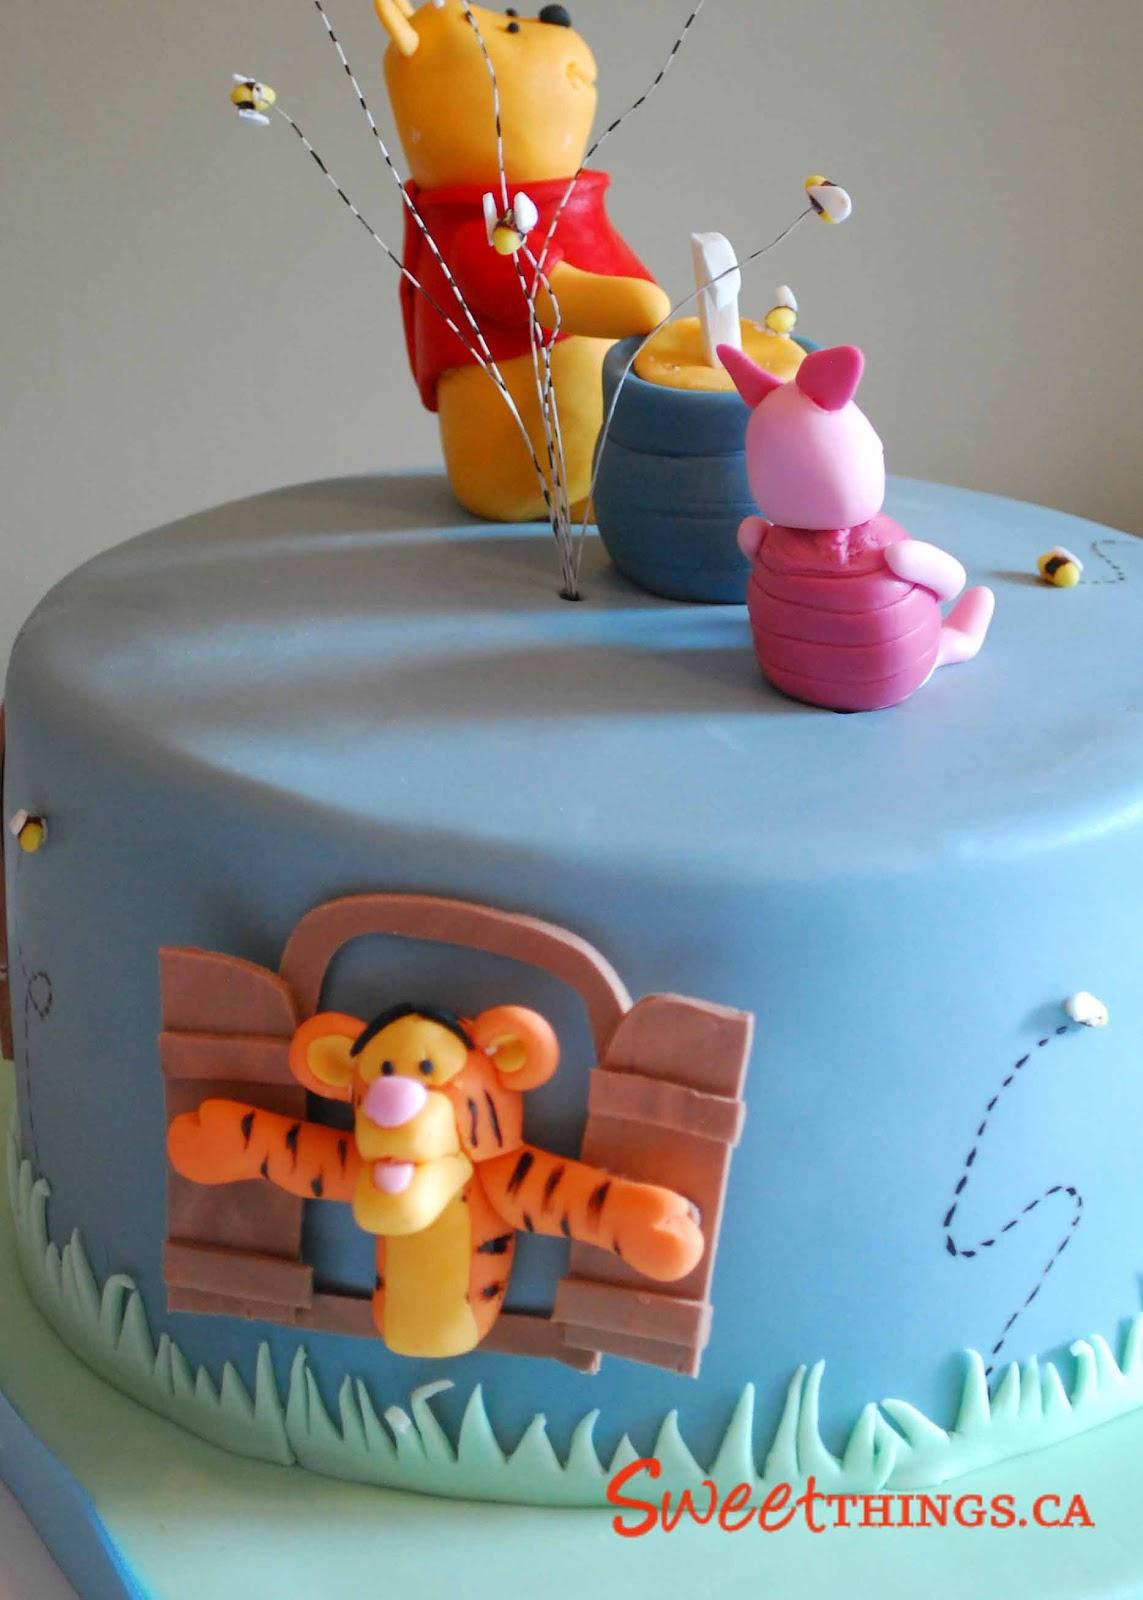 Sweetthings: Winnie The Pooh Cake avec Pooh Gateau